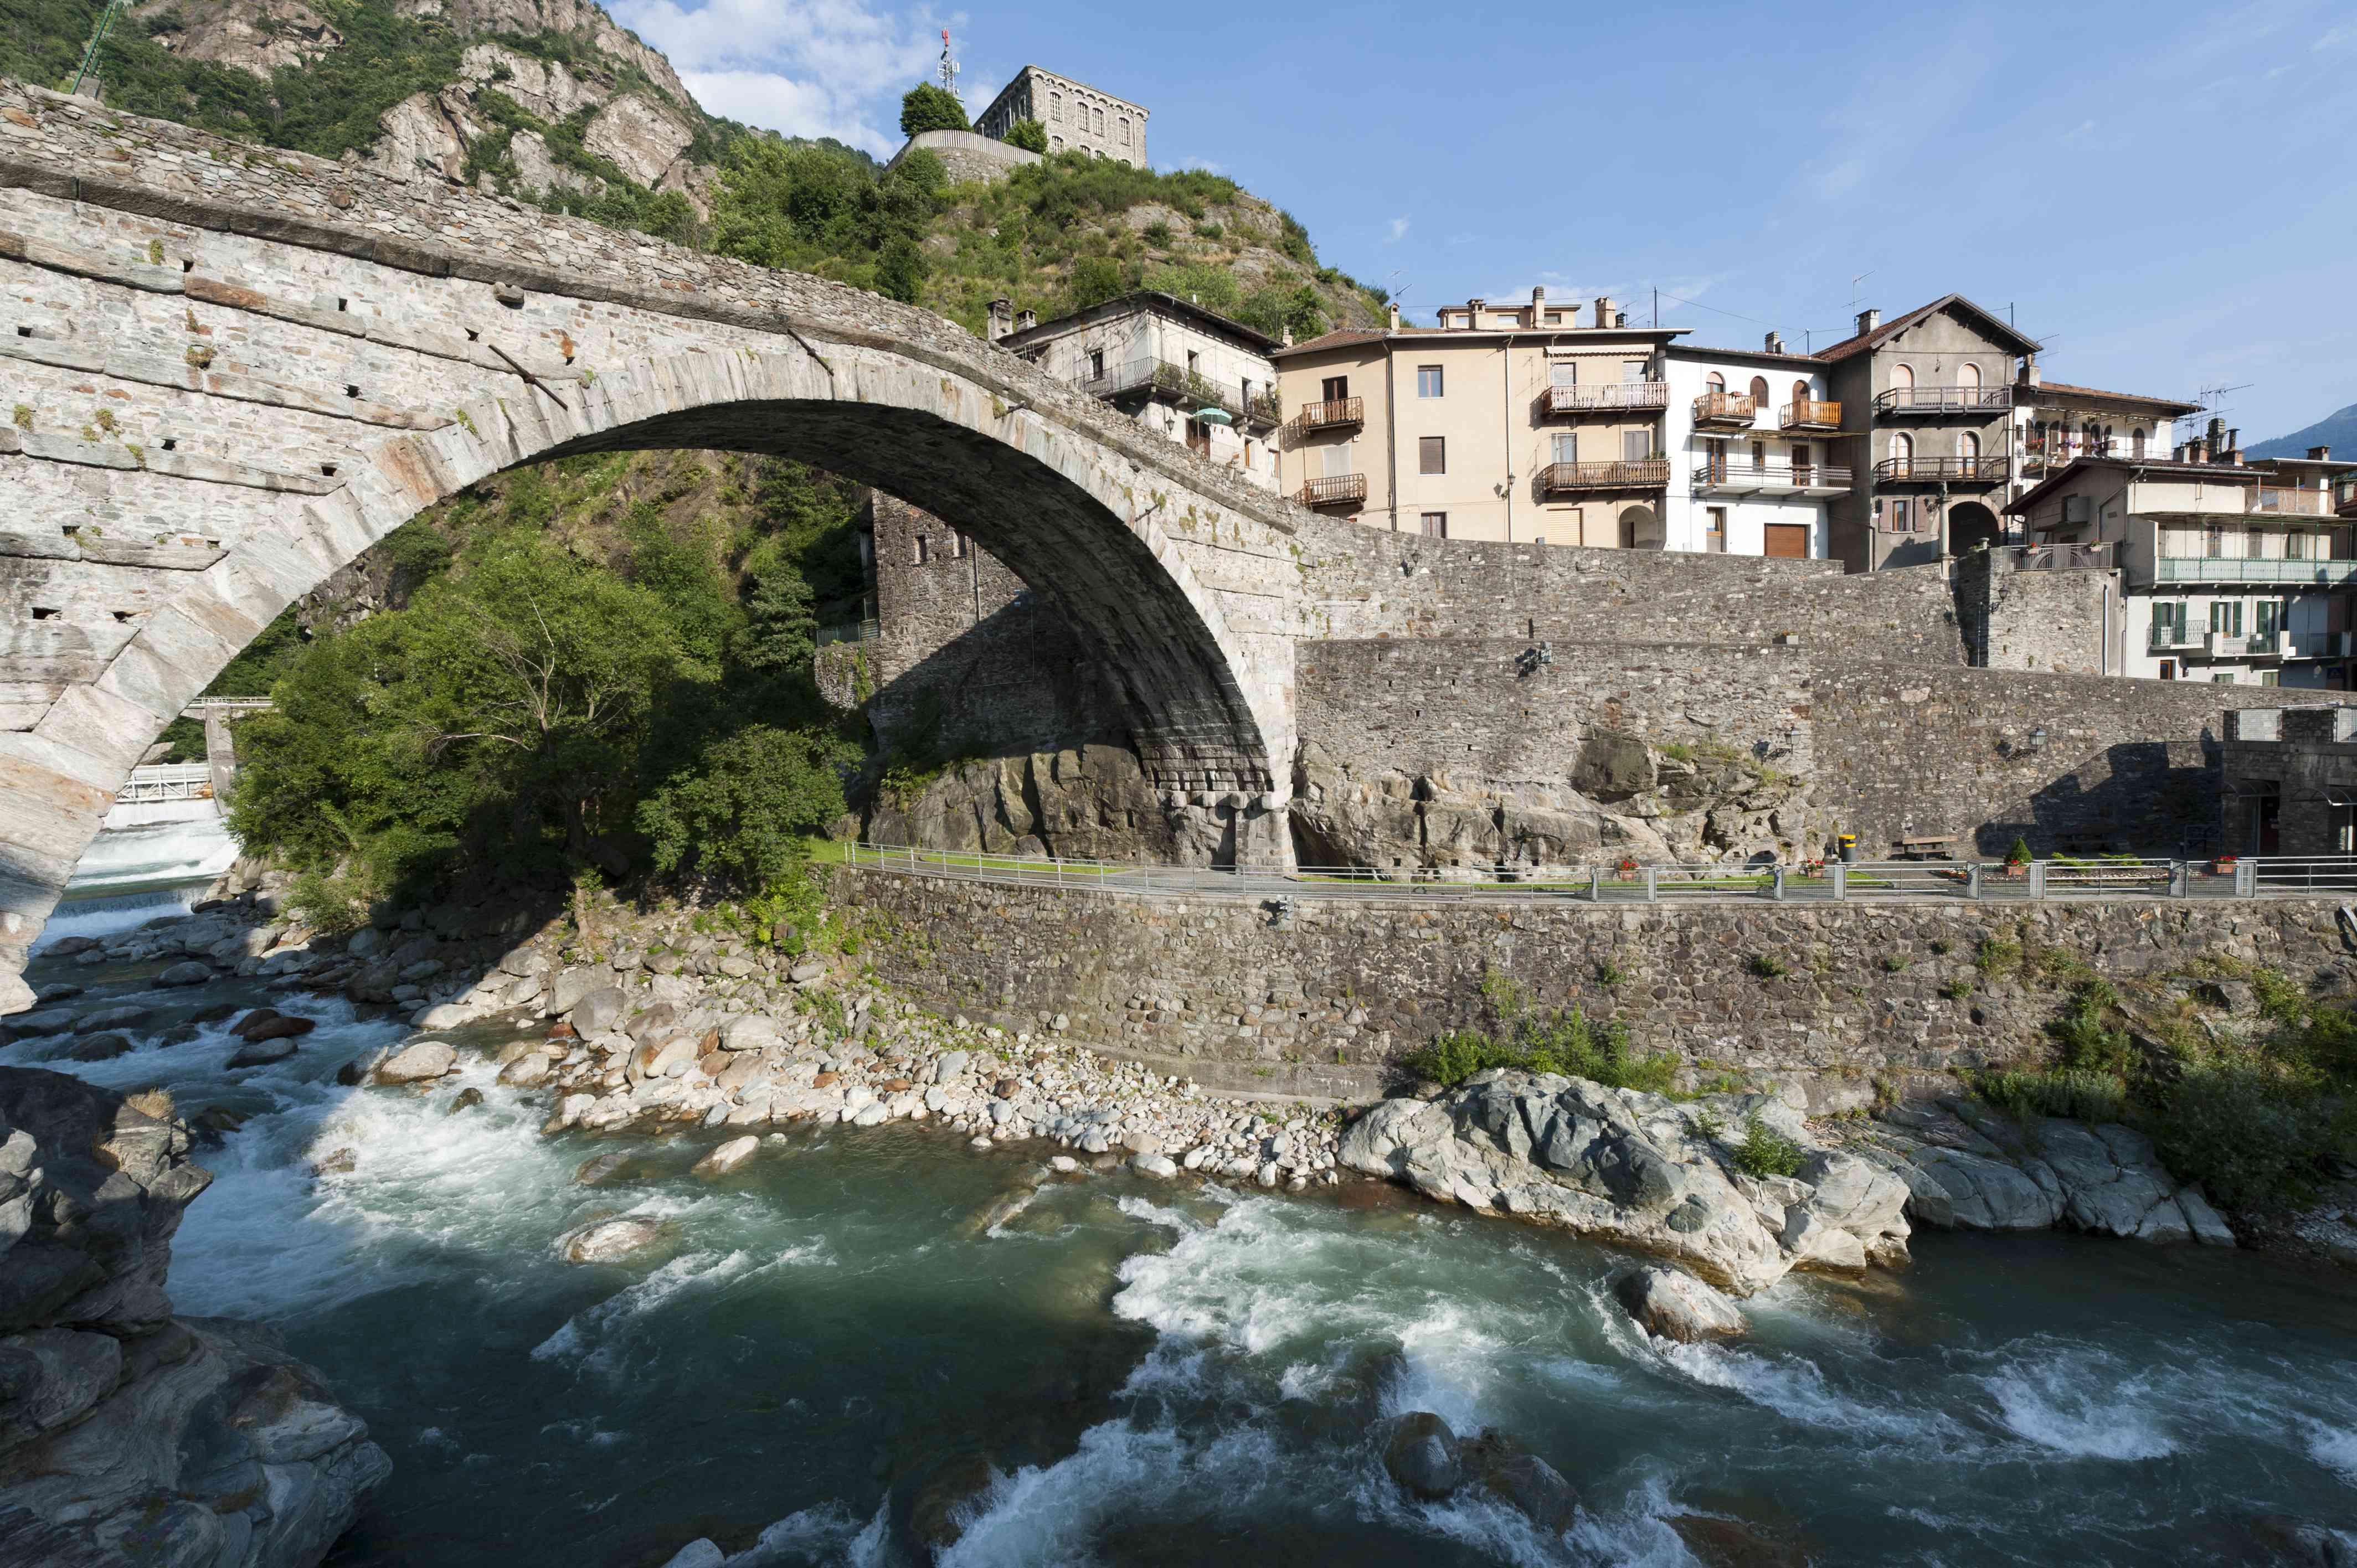 Roman bridge in Saint-Martin (Aosta, Italia)